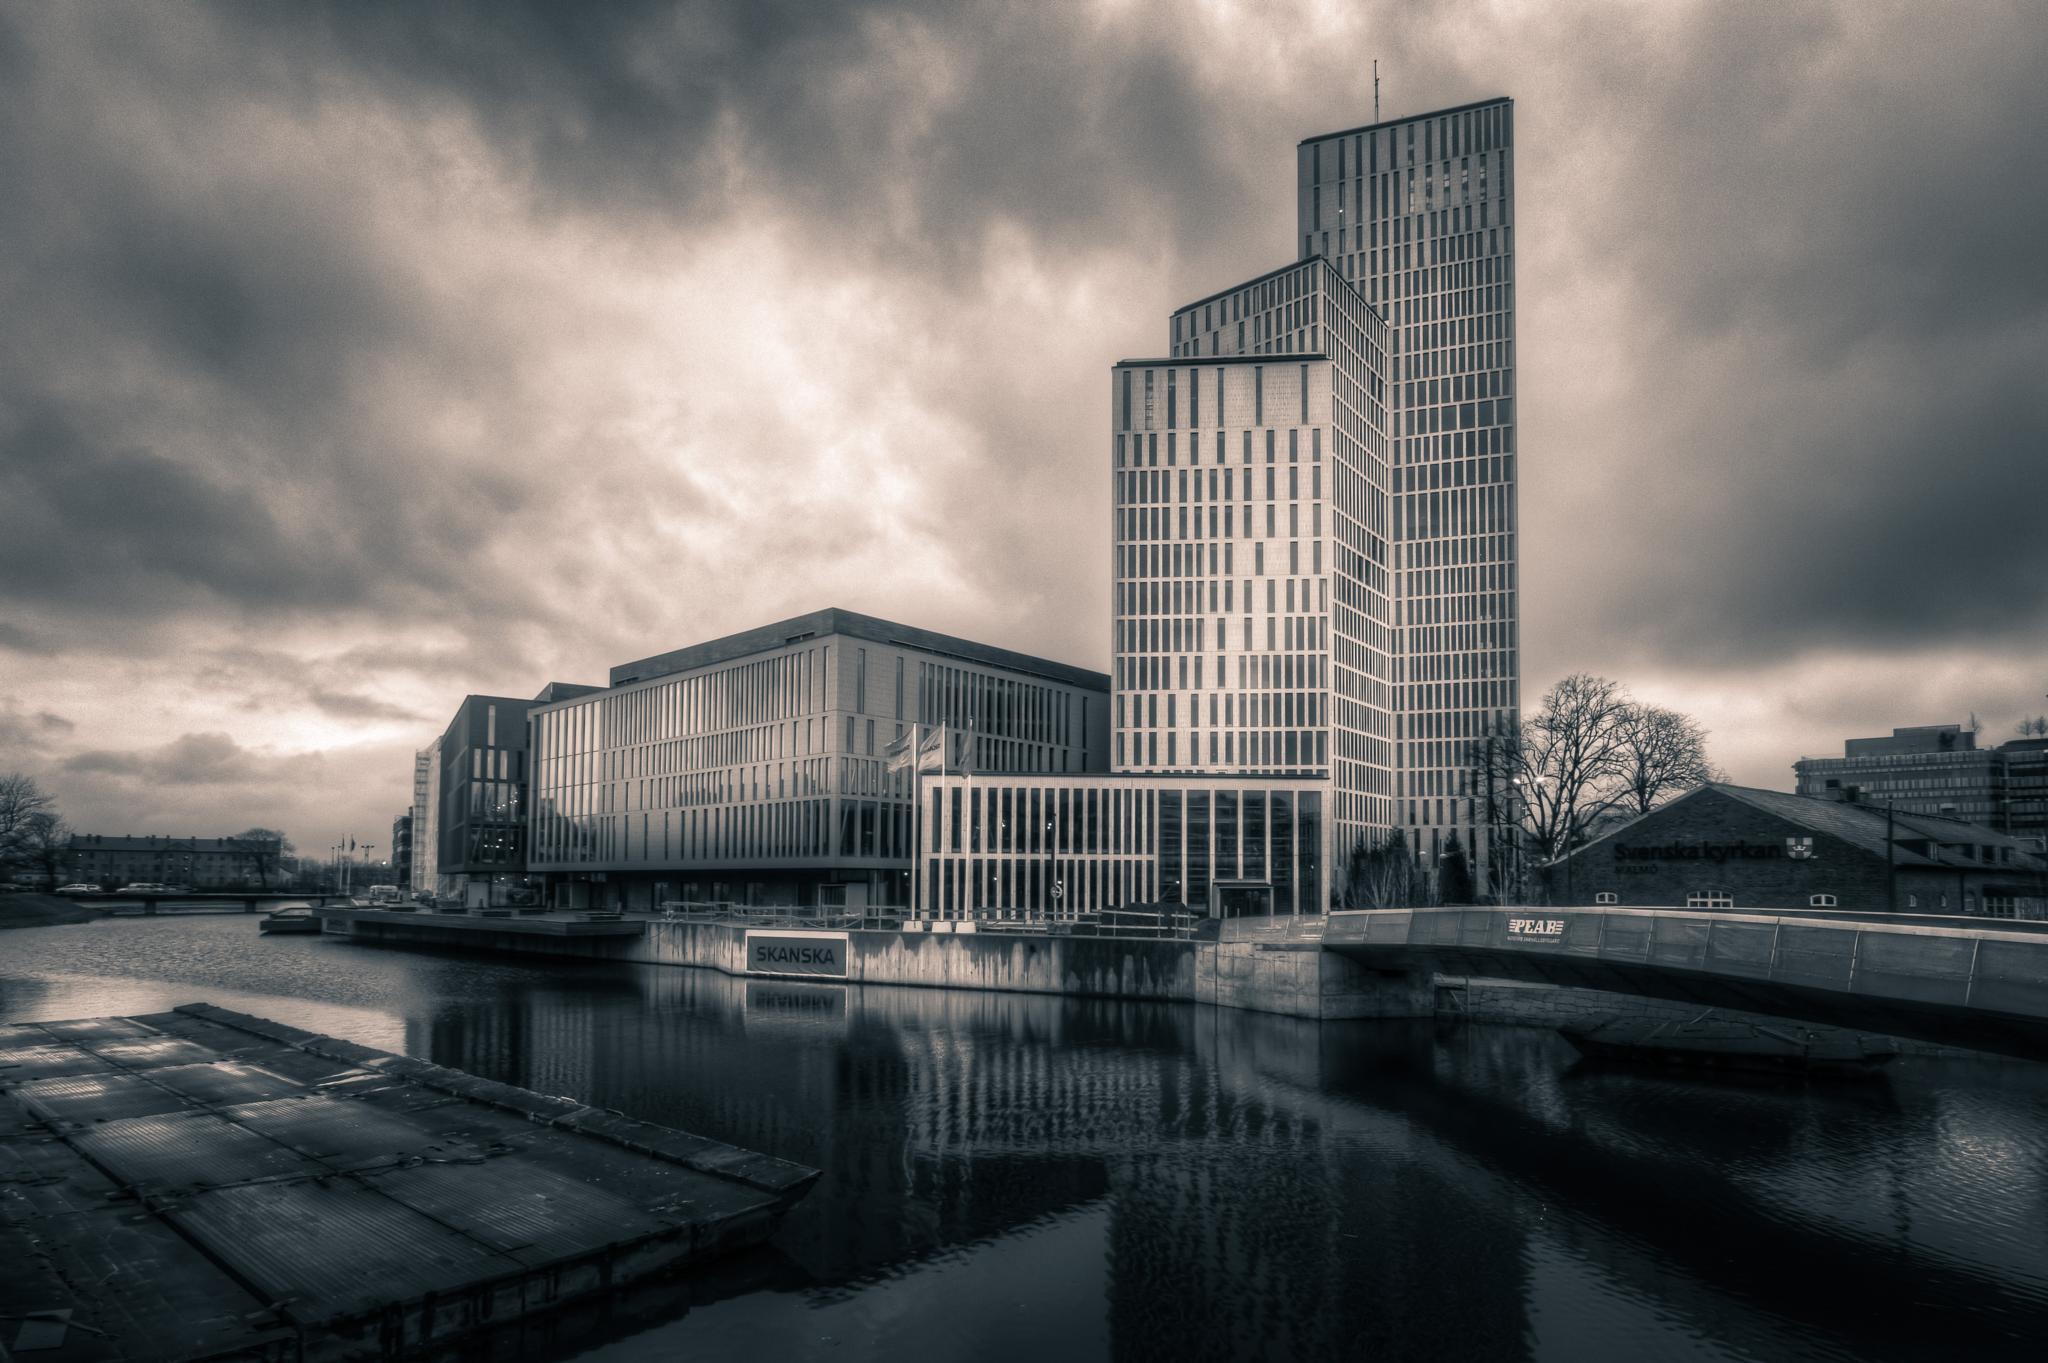 The three Towers by Mirza Buljusmic